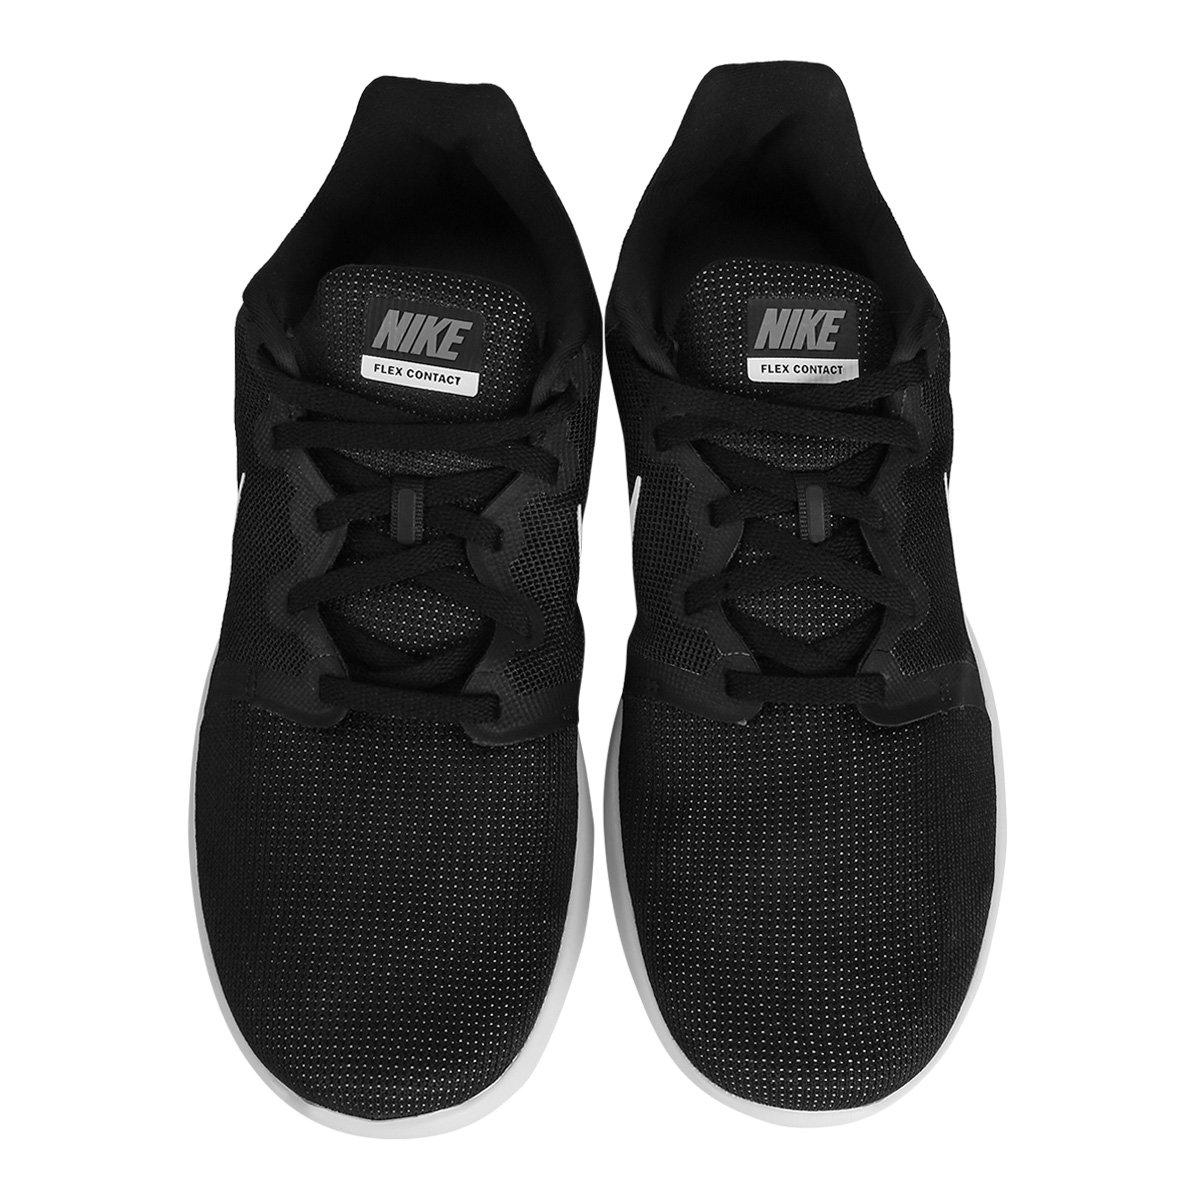 b4397a616a41a Tênis Nike Flex Contact 2 Masculino - Preto e Branco - Compre Agora ...